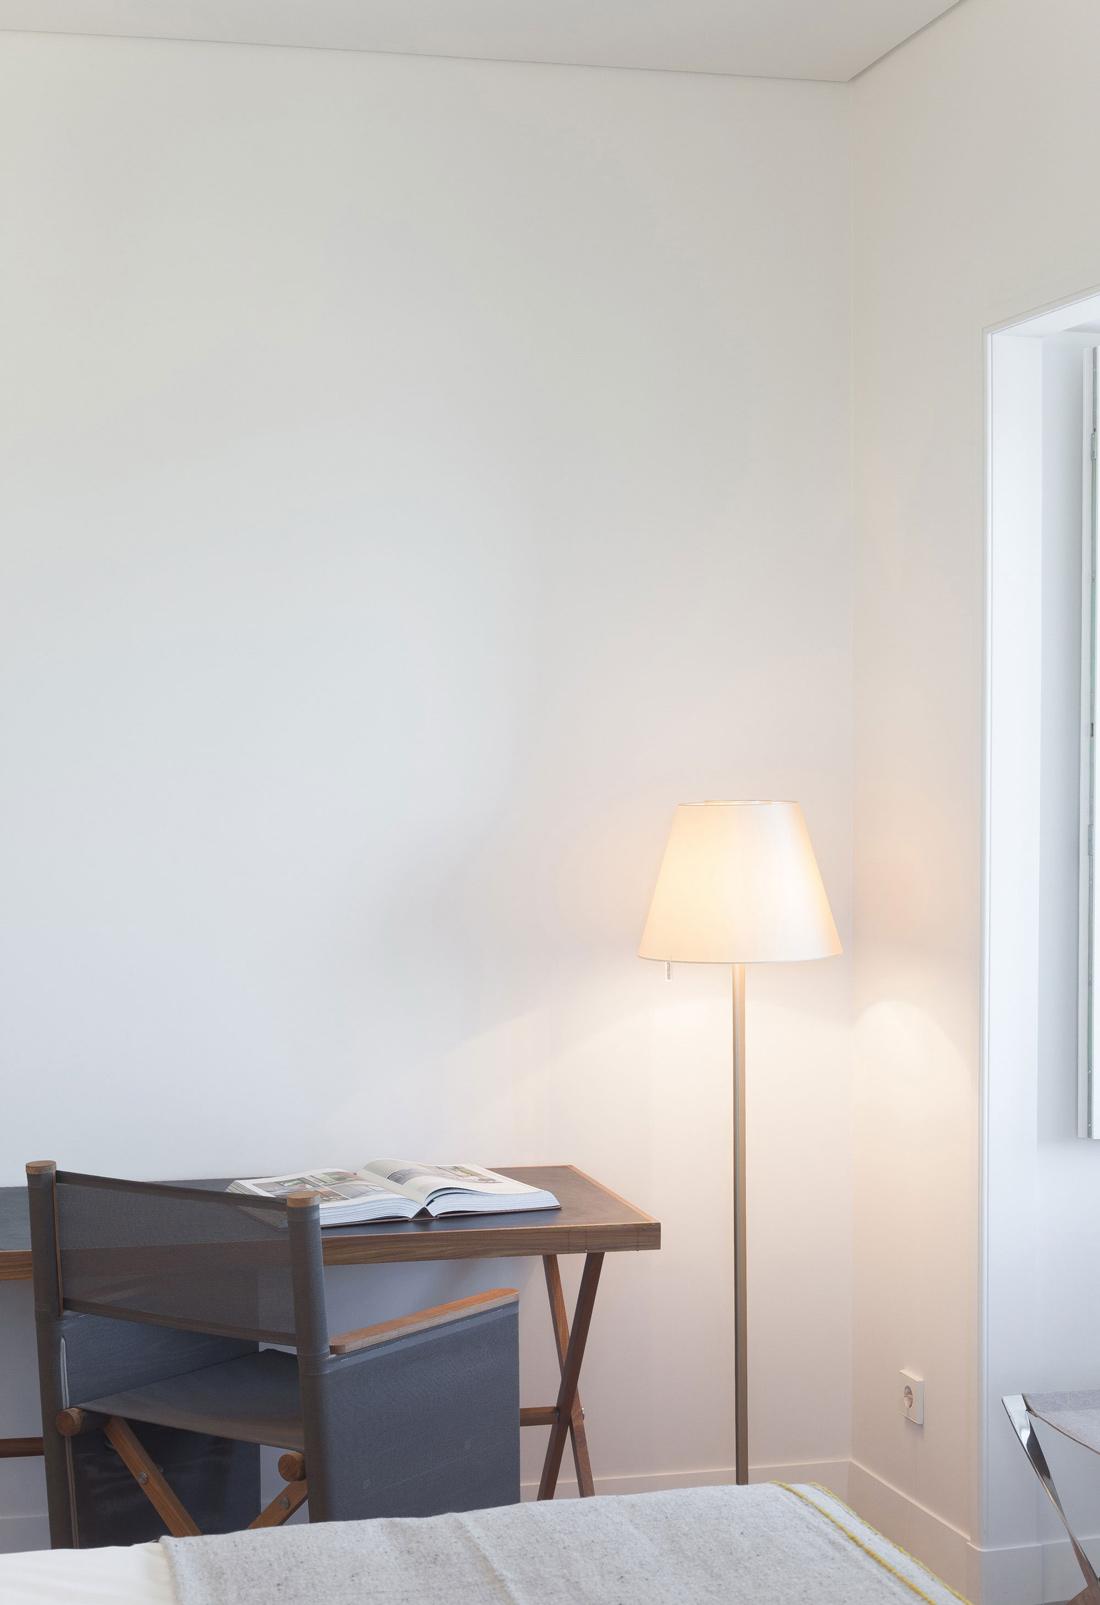 Floor Lamp, Desk, Boutique Hotel in the Heart of Alfama, Lisbon